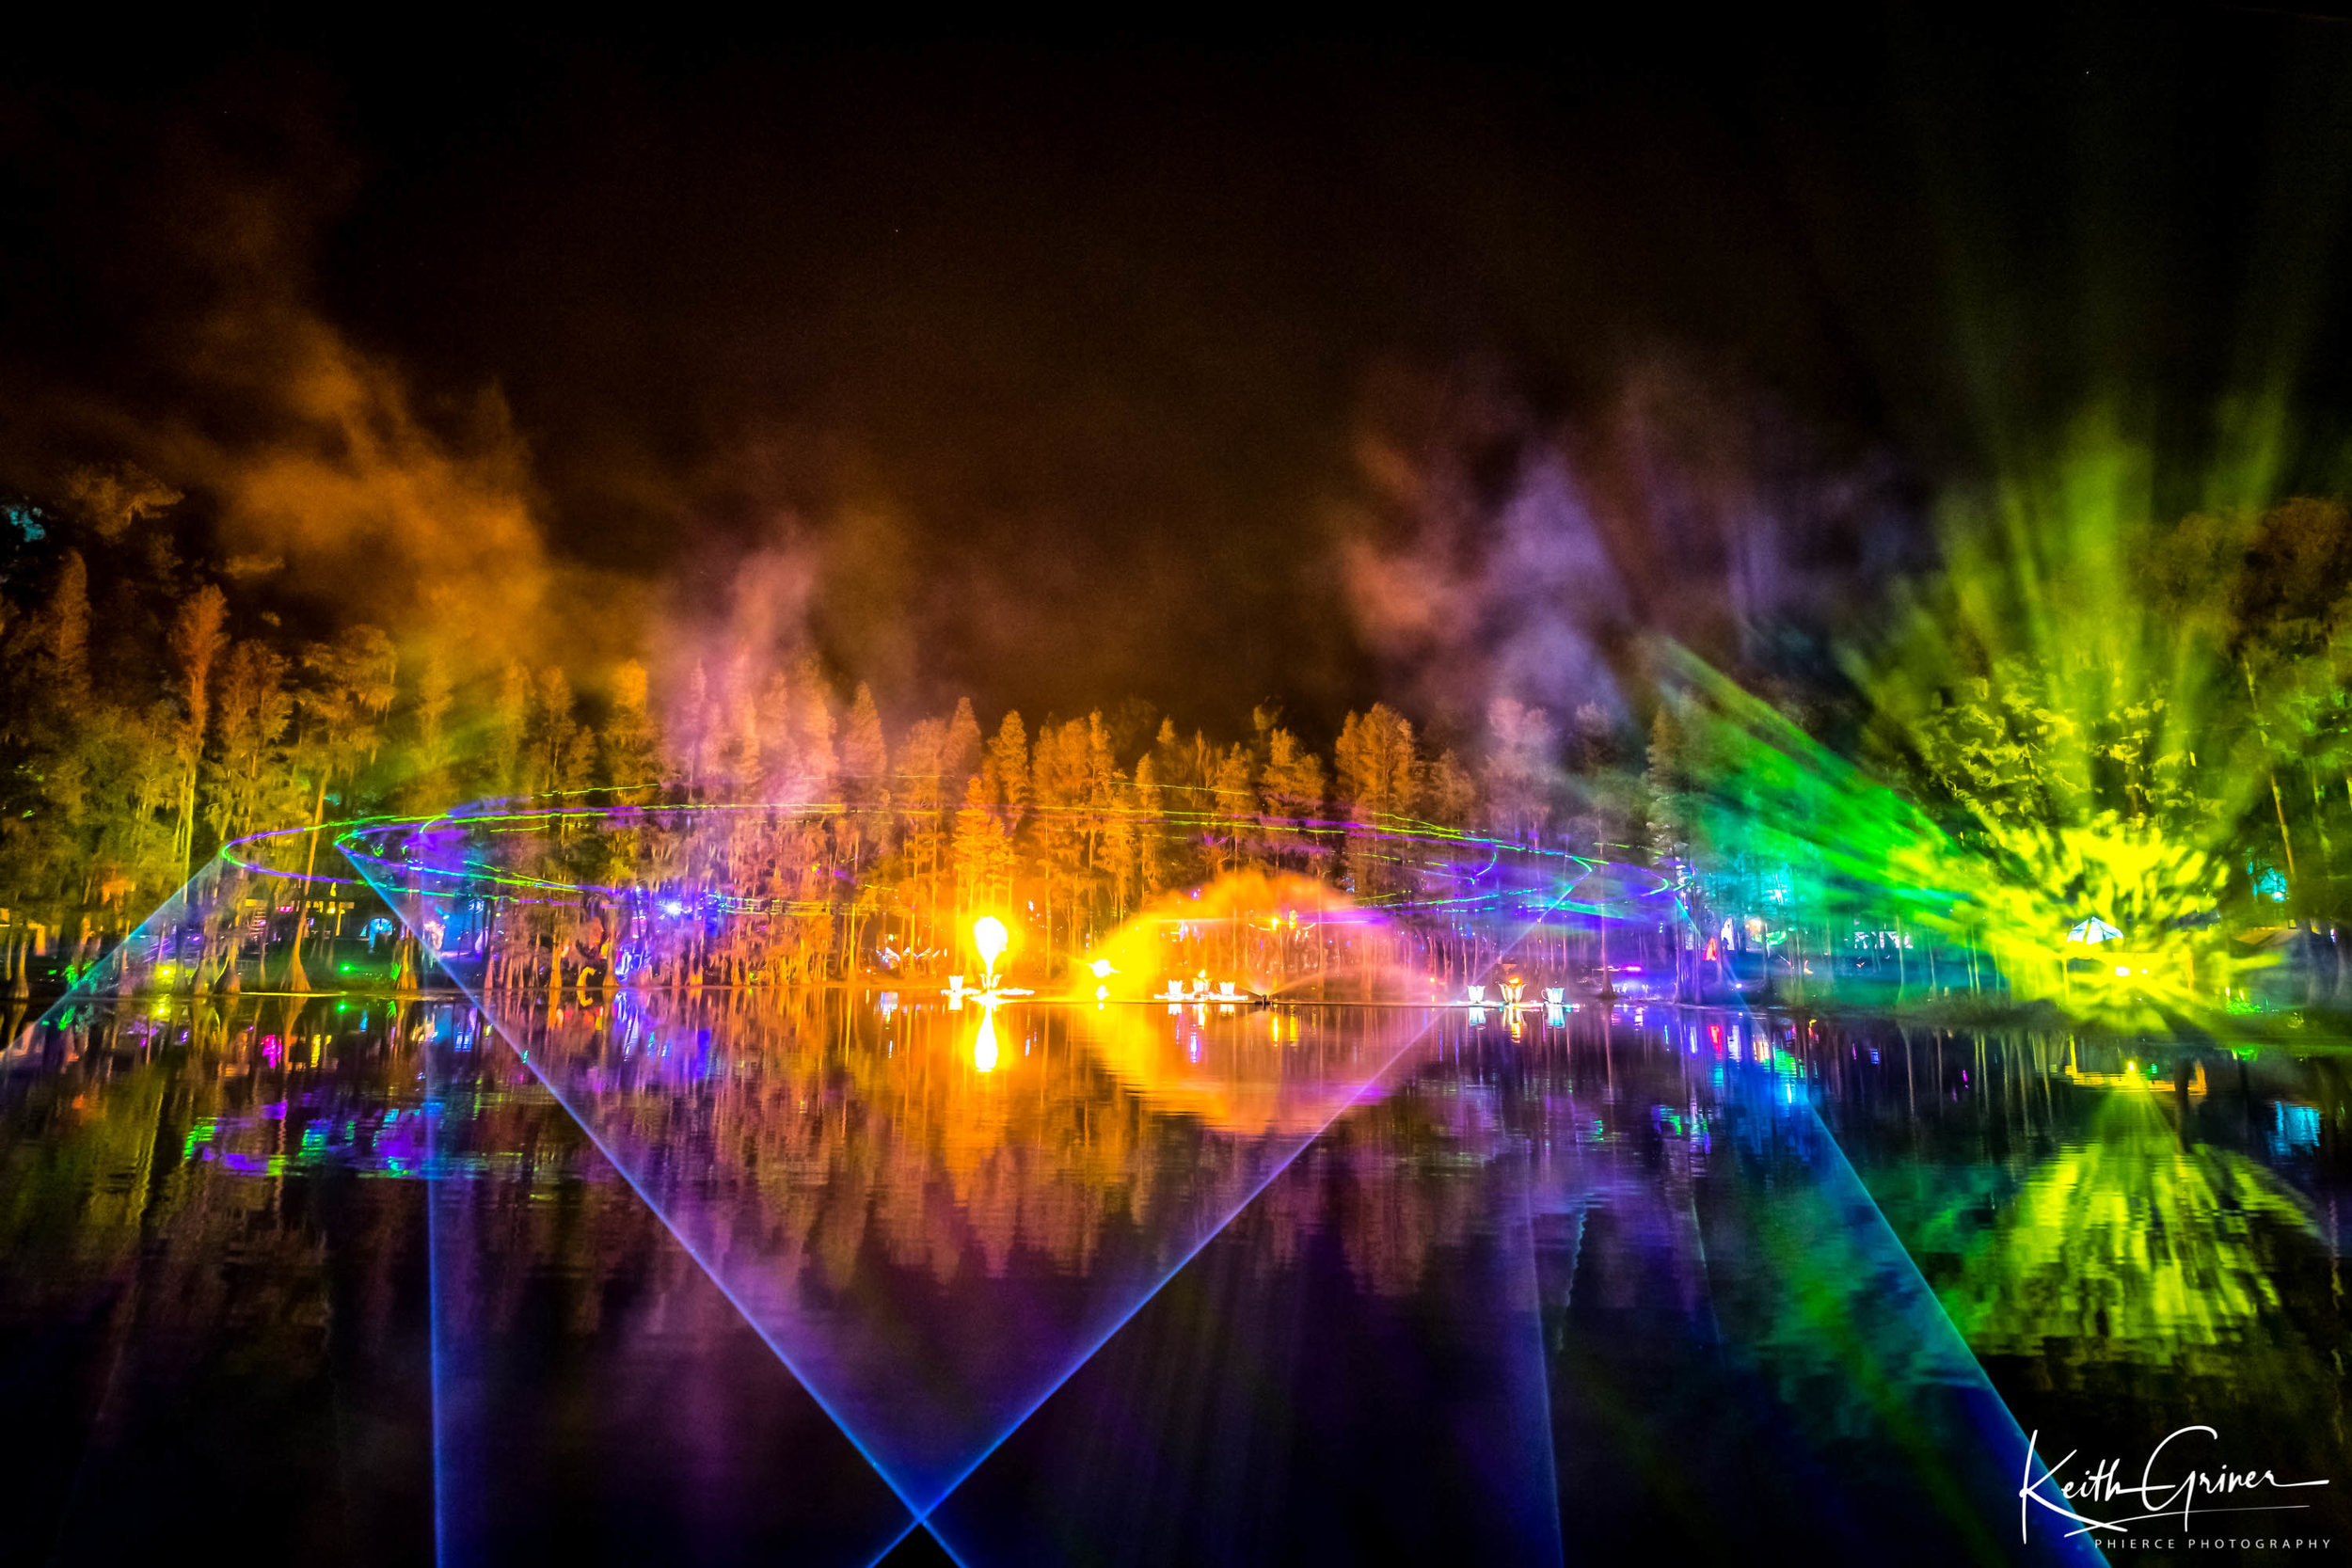 Hula_Spirit Lake_by Keith Griner 0D5_3313-Edit.jpg